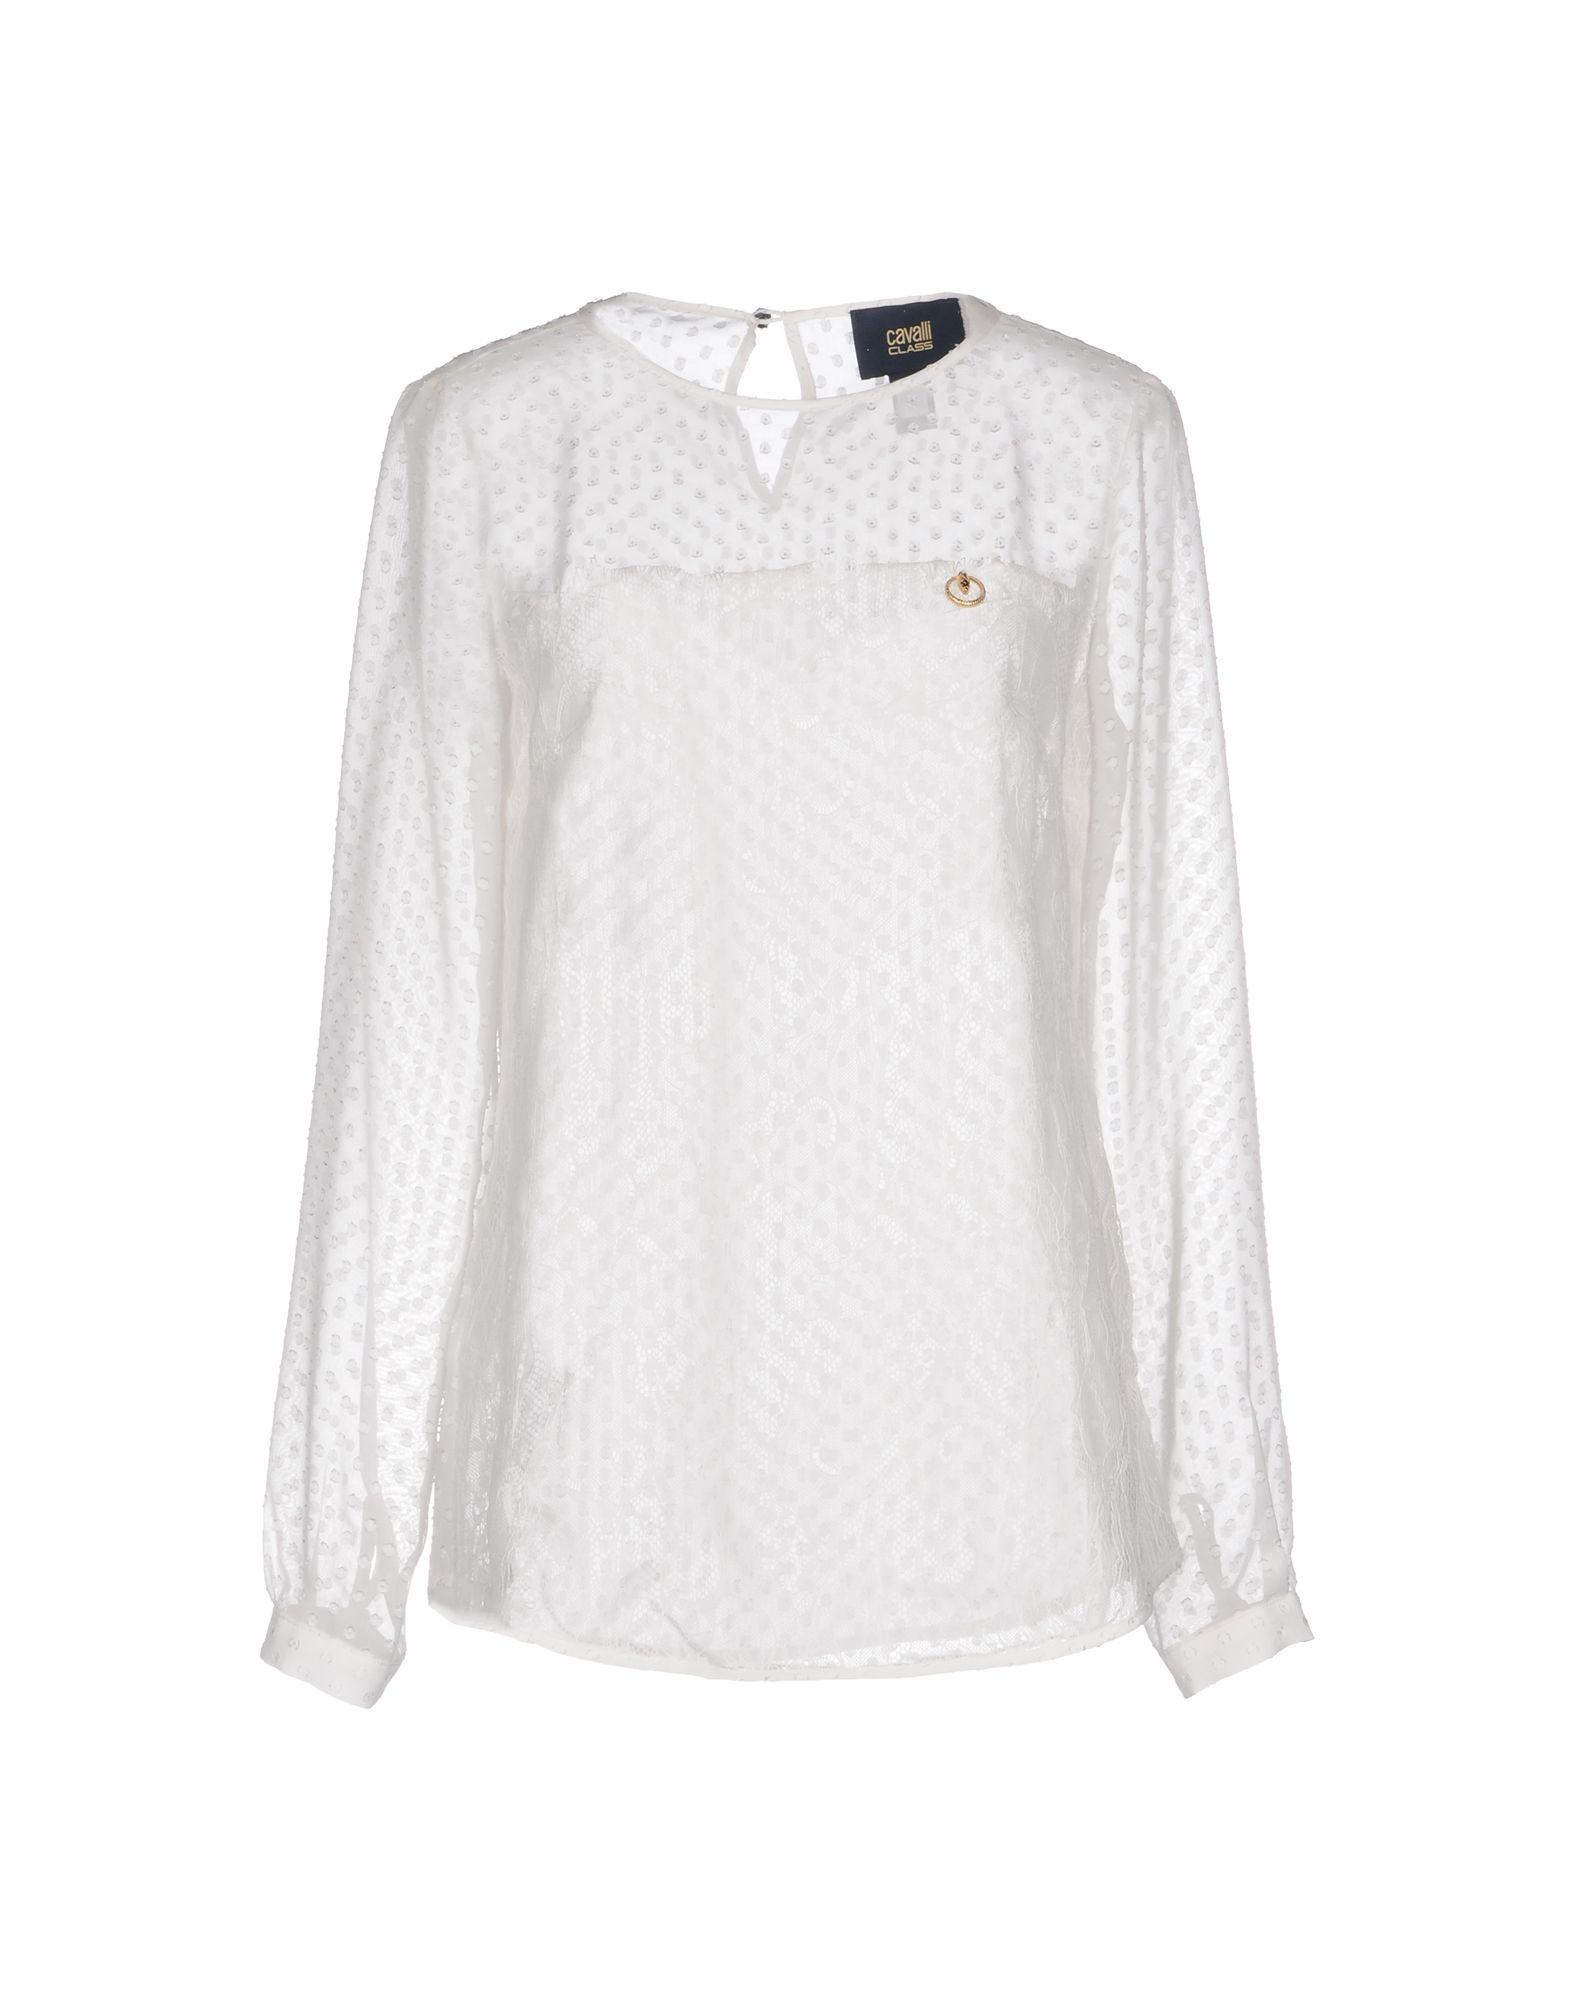 CLASS ROBERTO CAVALLI Damen Hemd Farbe Weiß Größe 3